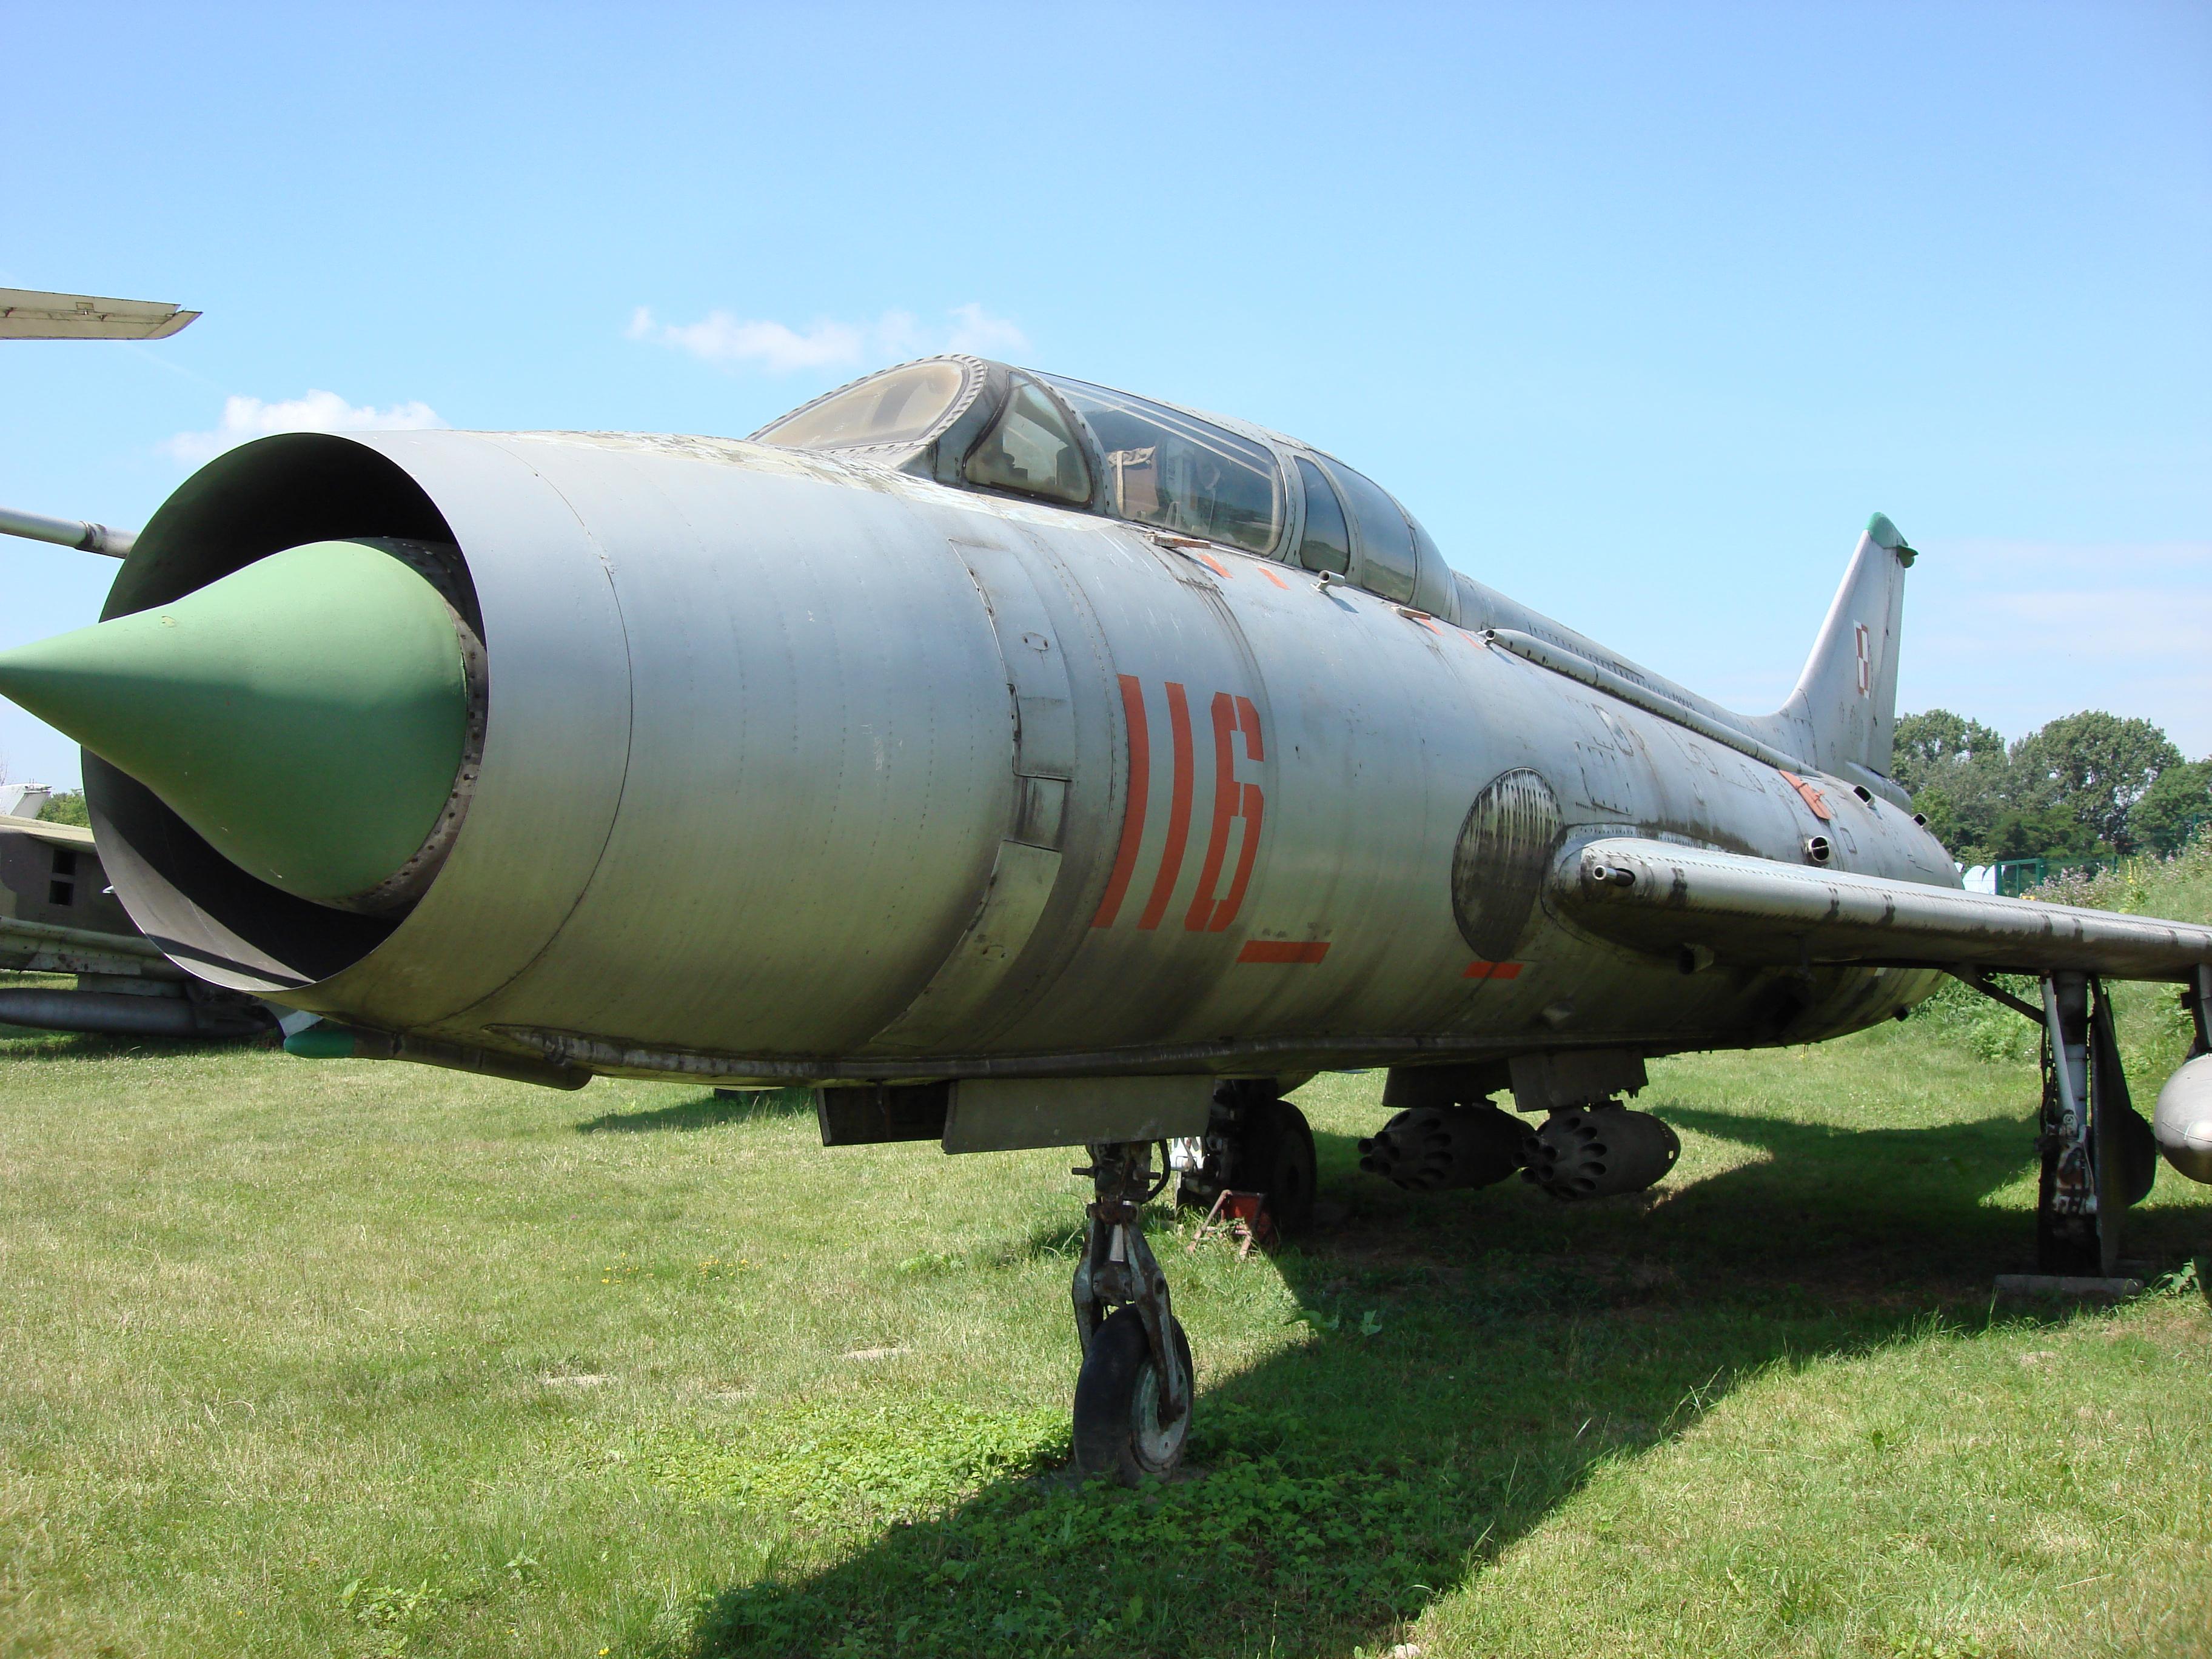 Su-7 U nb 116 nr 2116. 2007 rok. Zdjęcie Karol Placha Hetman